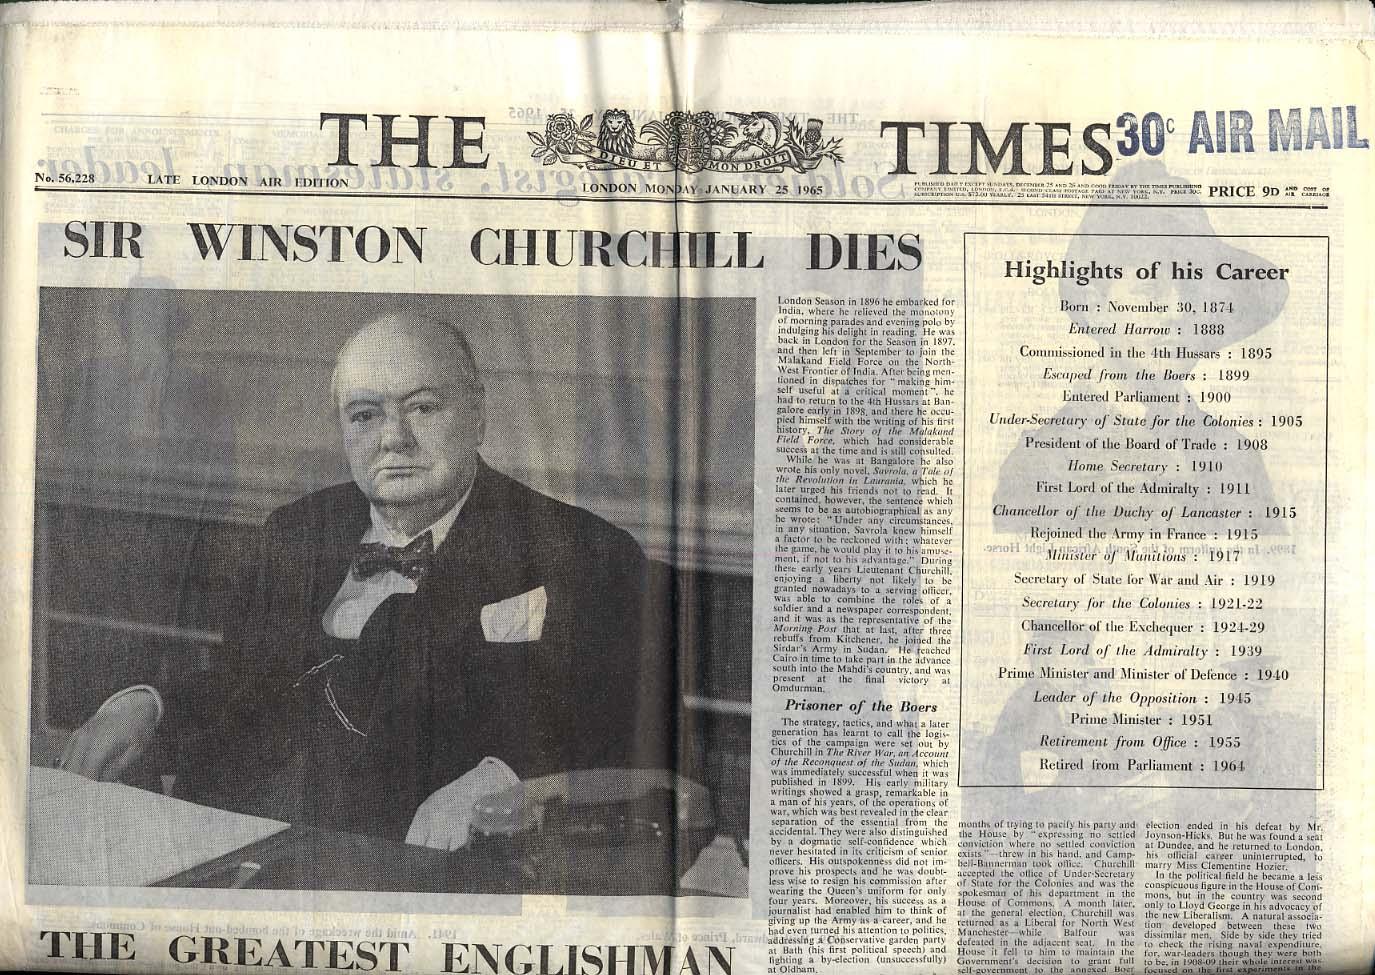 The LONDON TIMES 1/25 1965 Winston Churchill Dies: Late London Air Edition